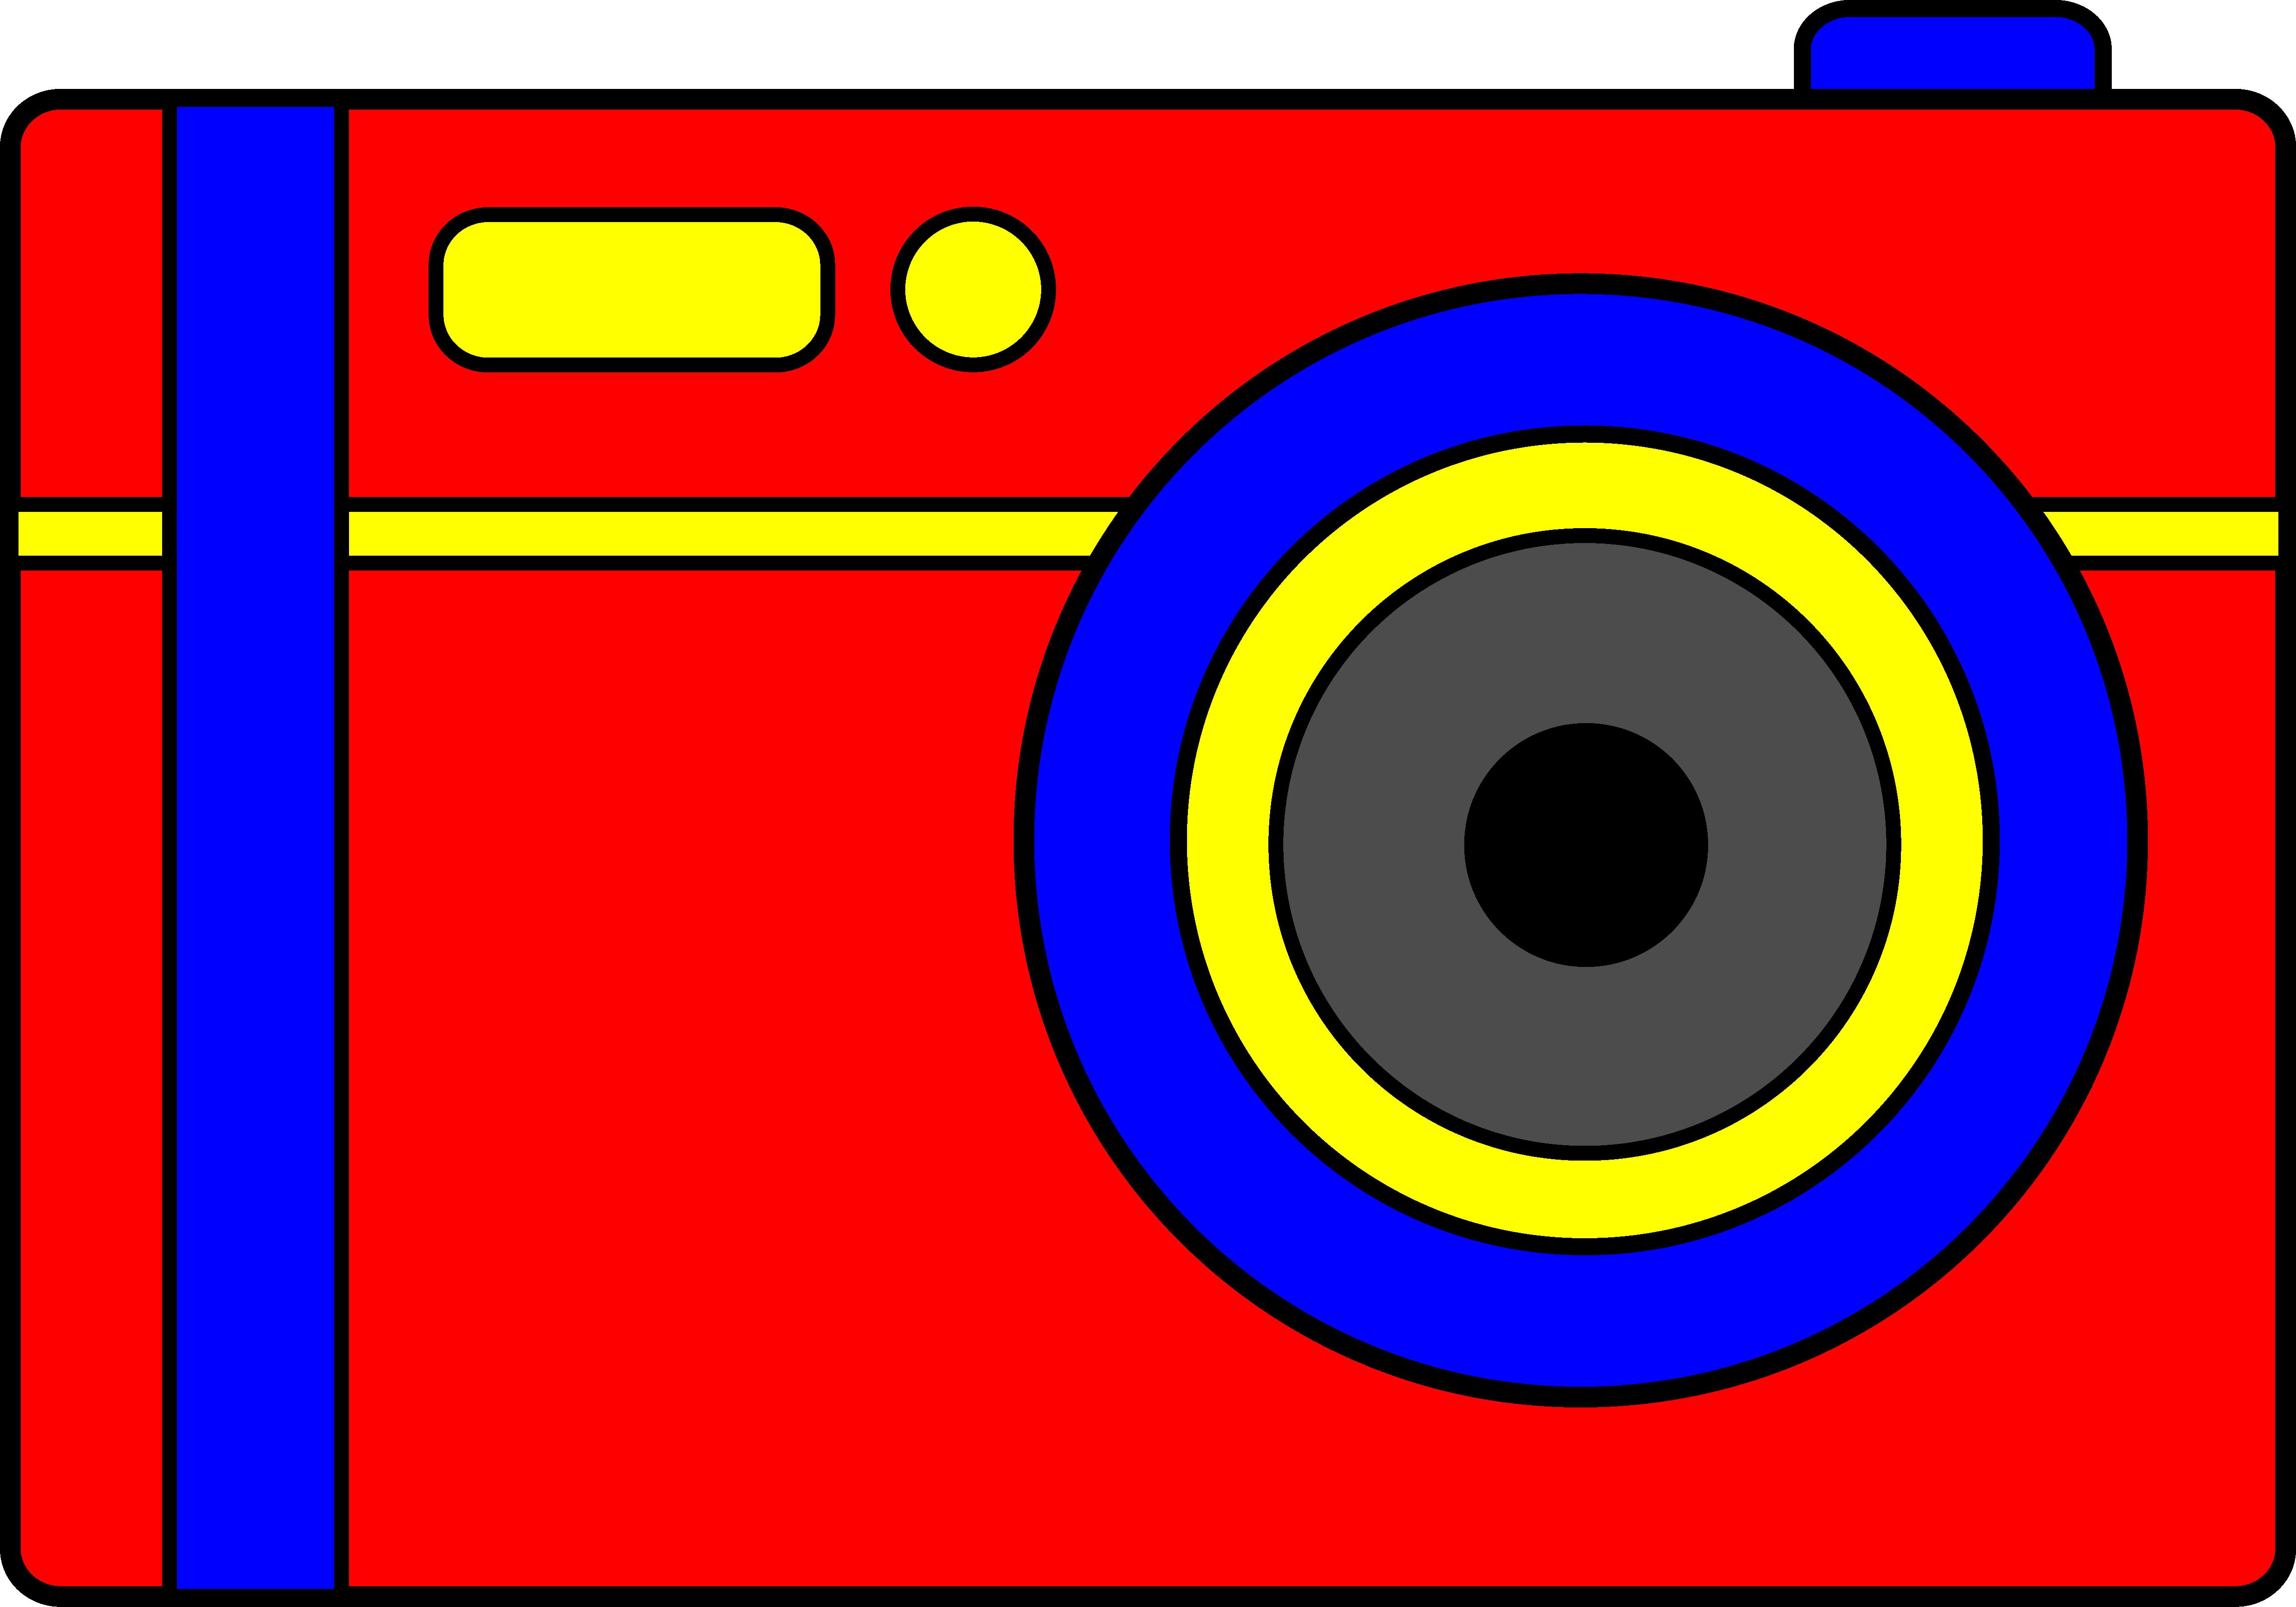 Camera Clip Art Free - ClipArt Best